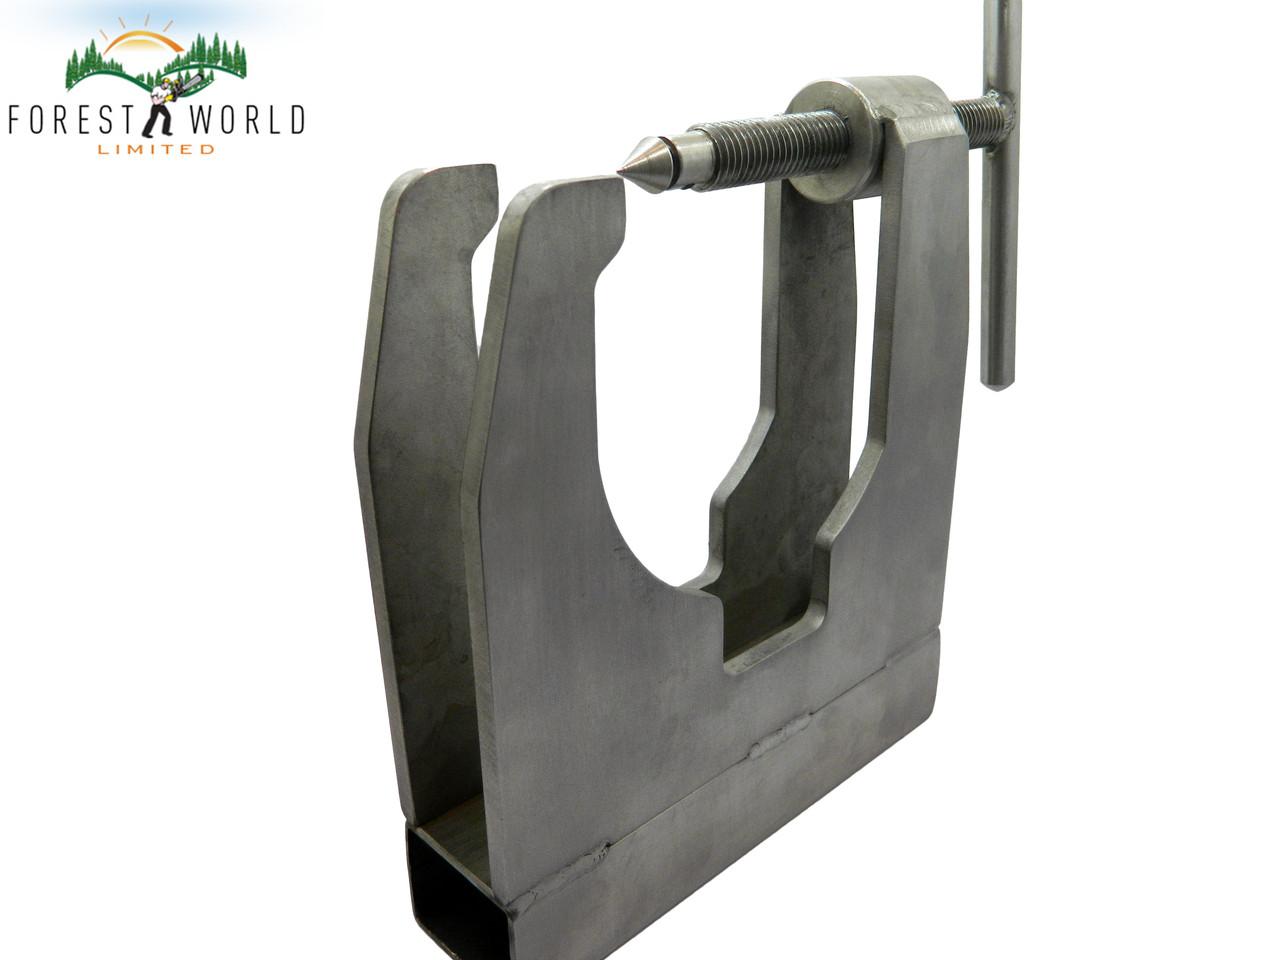 Husqvarna & Jonsered chainsaw crankcase splitter tool,chainsaw repair shop  equipment